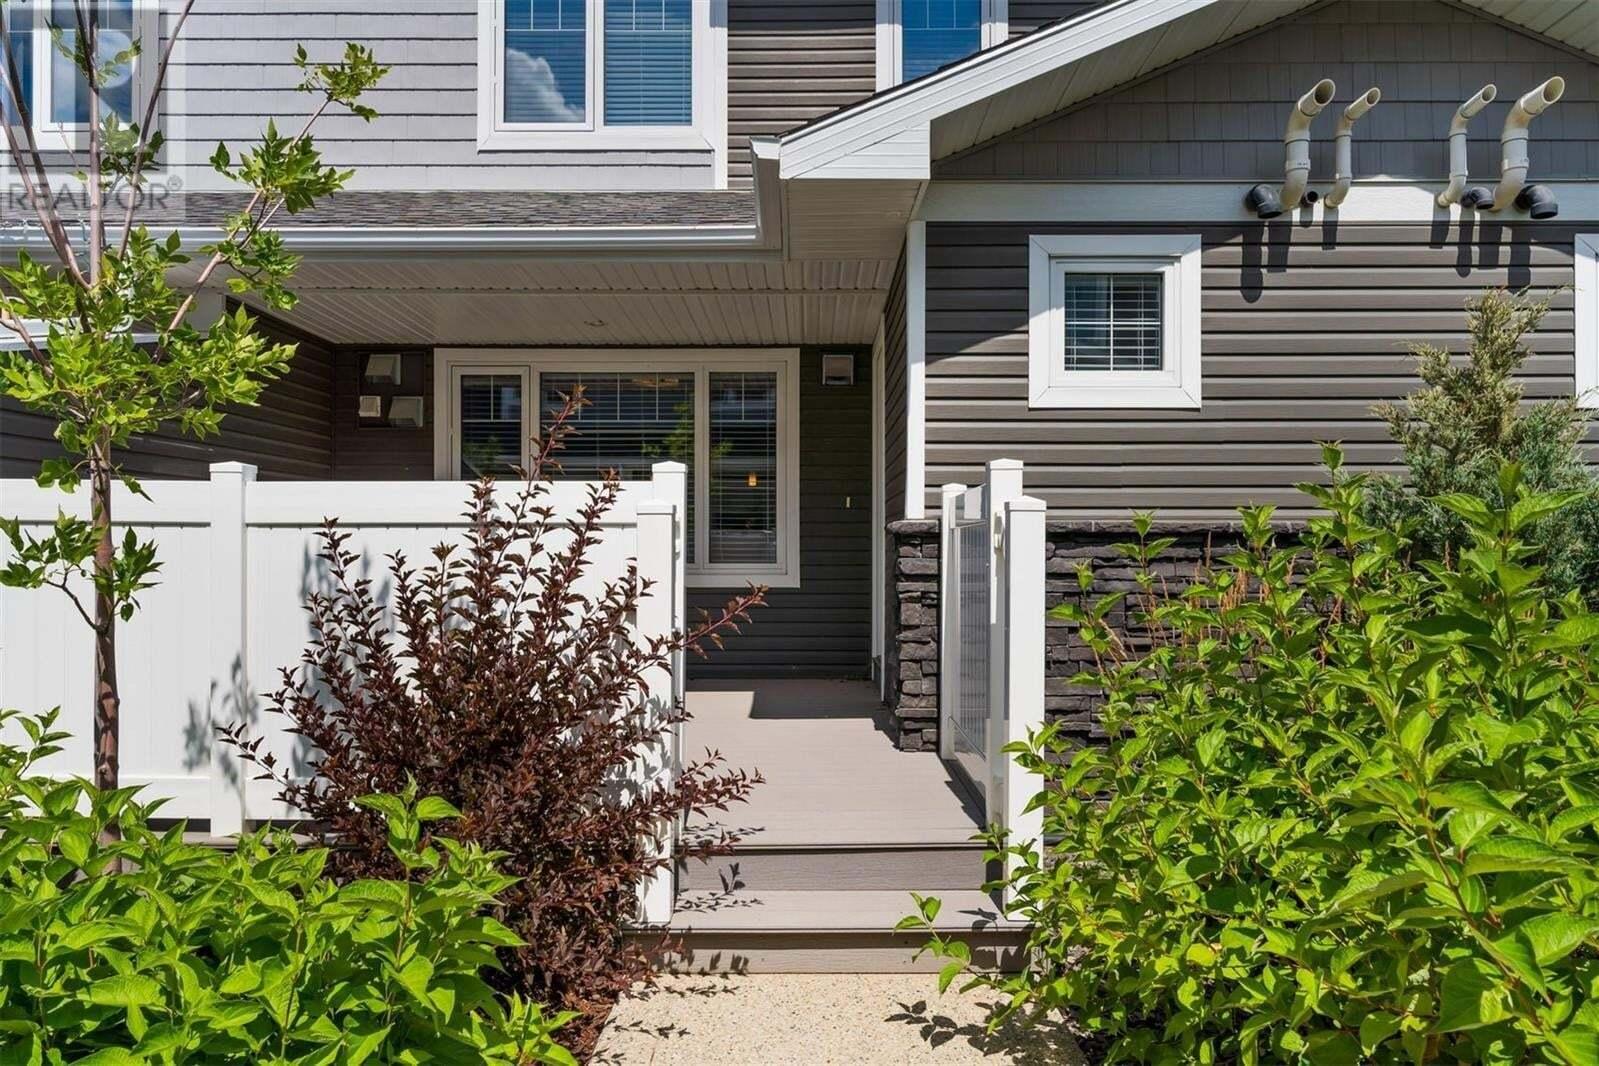 Townhouse for sale at 3459 Elgaard Dr Regina Saskatchewan - MLS: SK821513